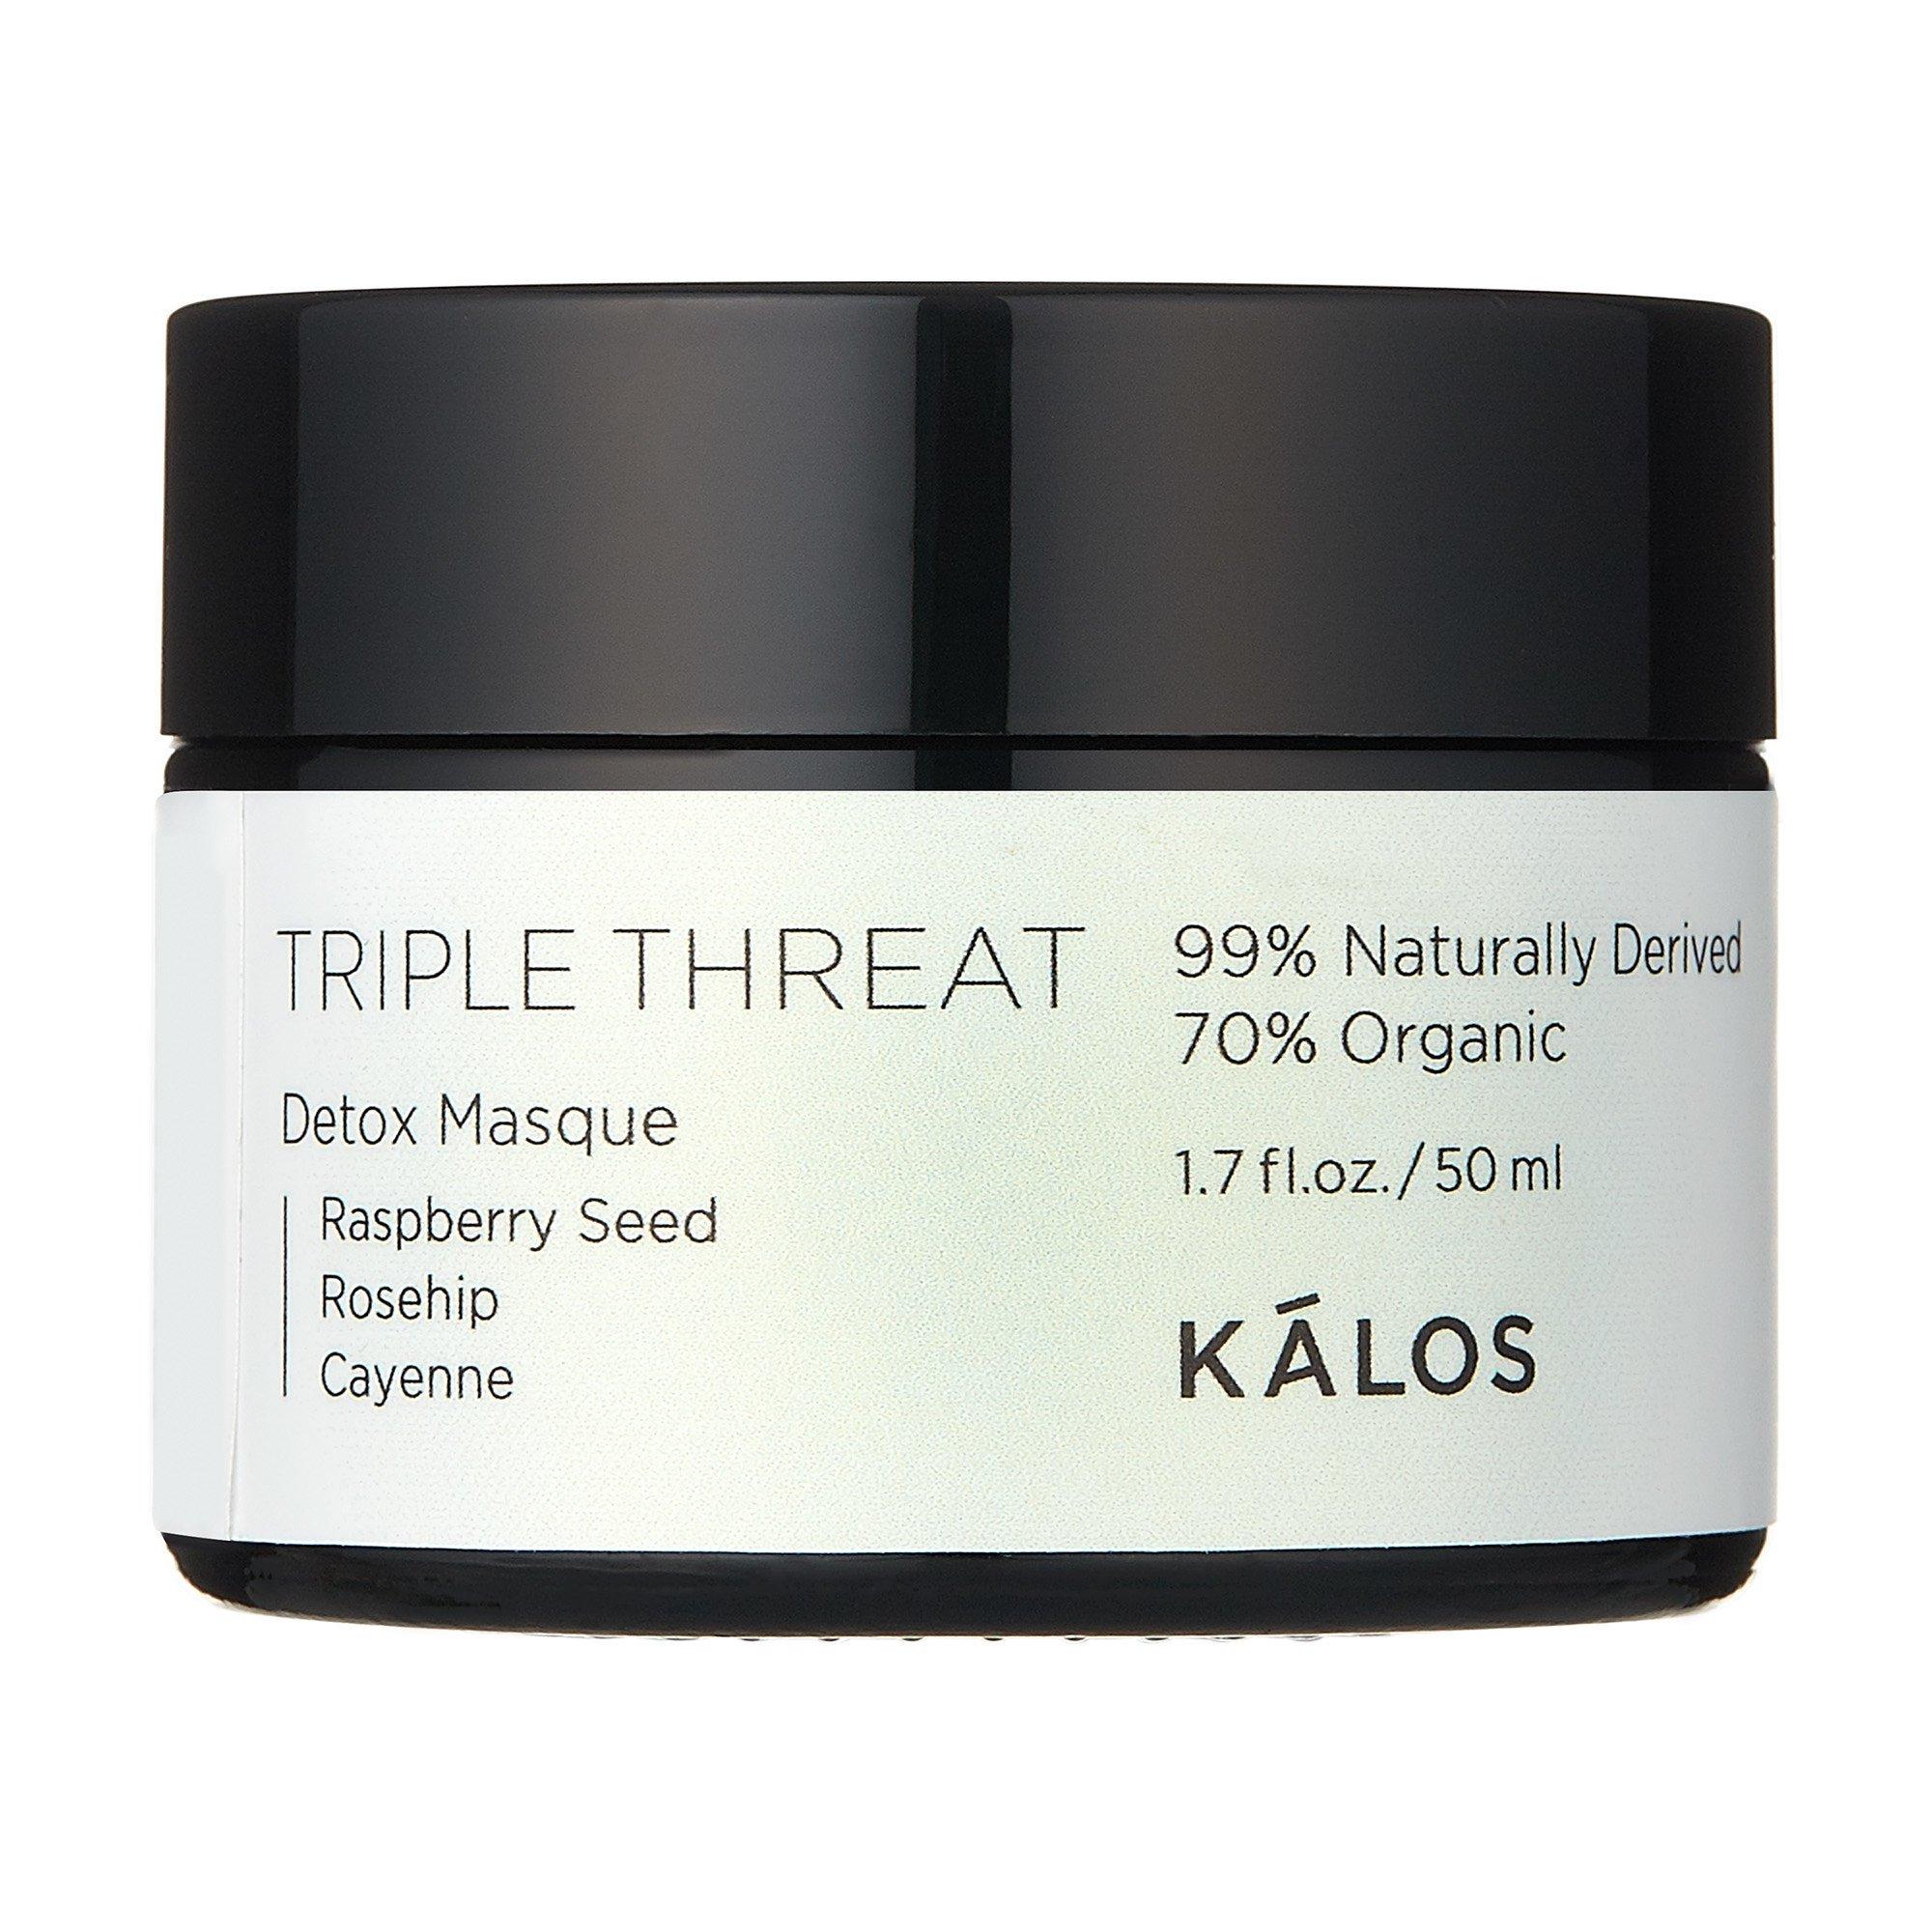 Kálos Skin   Triple Threat, Detox Masque